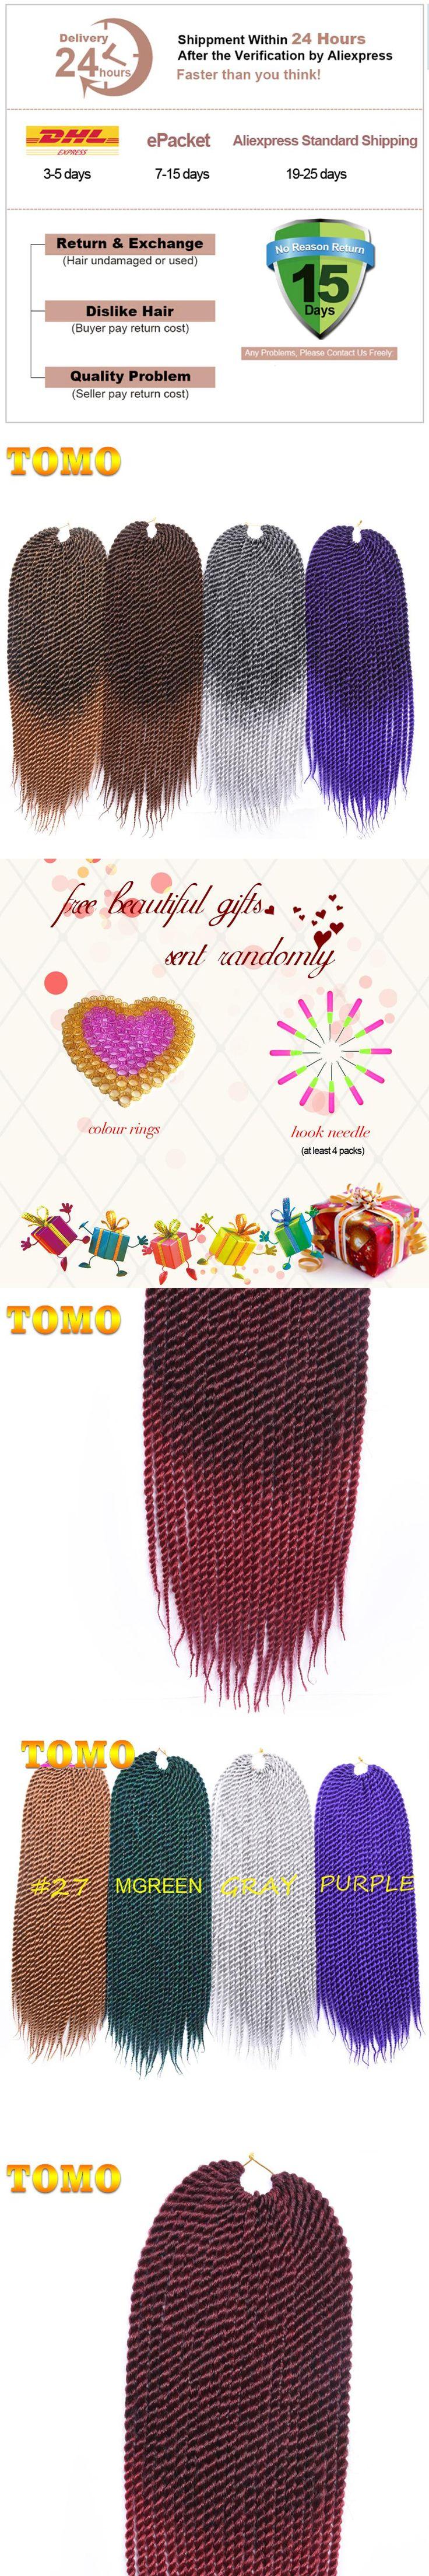 TOMO 22 inch Medium Ombre Crotchet Braids 22roots Kanekalon Synthetic Hair For Braiding Senegalese Twist Crochet Hair Weave